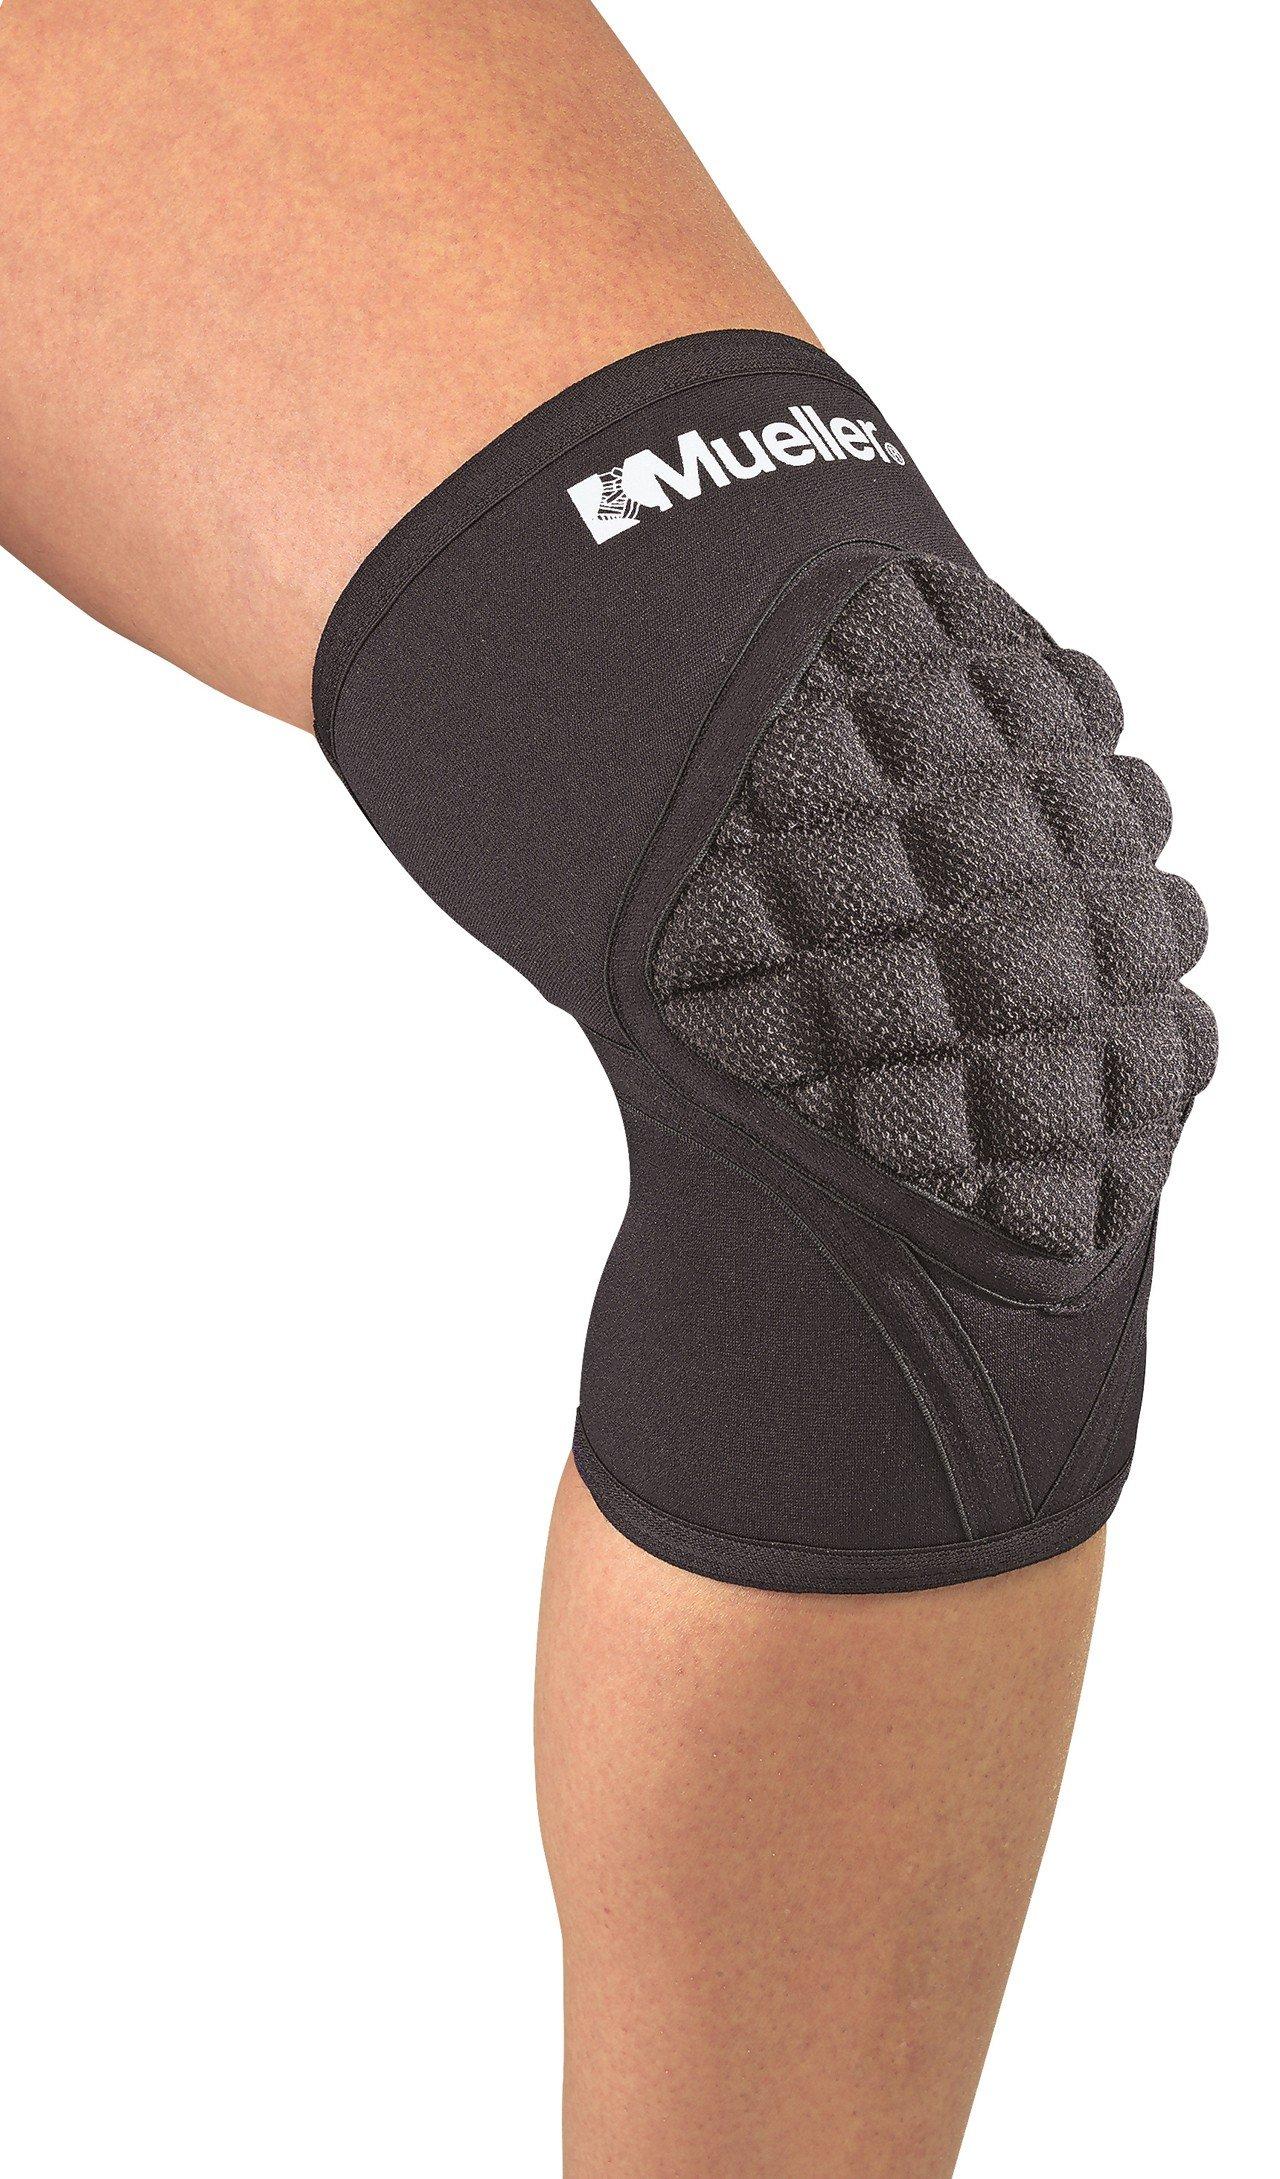 Mueller Pro Level Knee Pad with Kevlar, Black, Medium